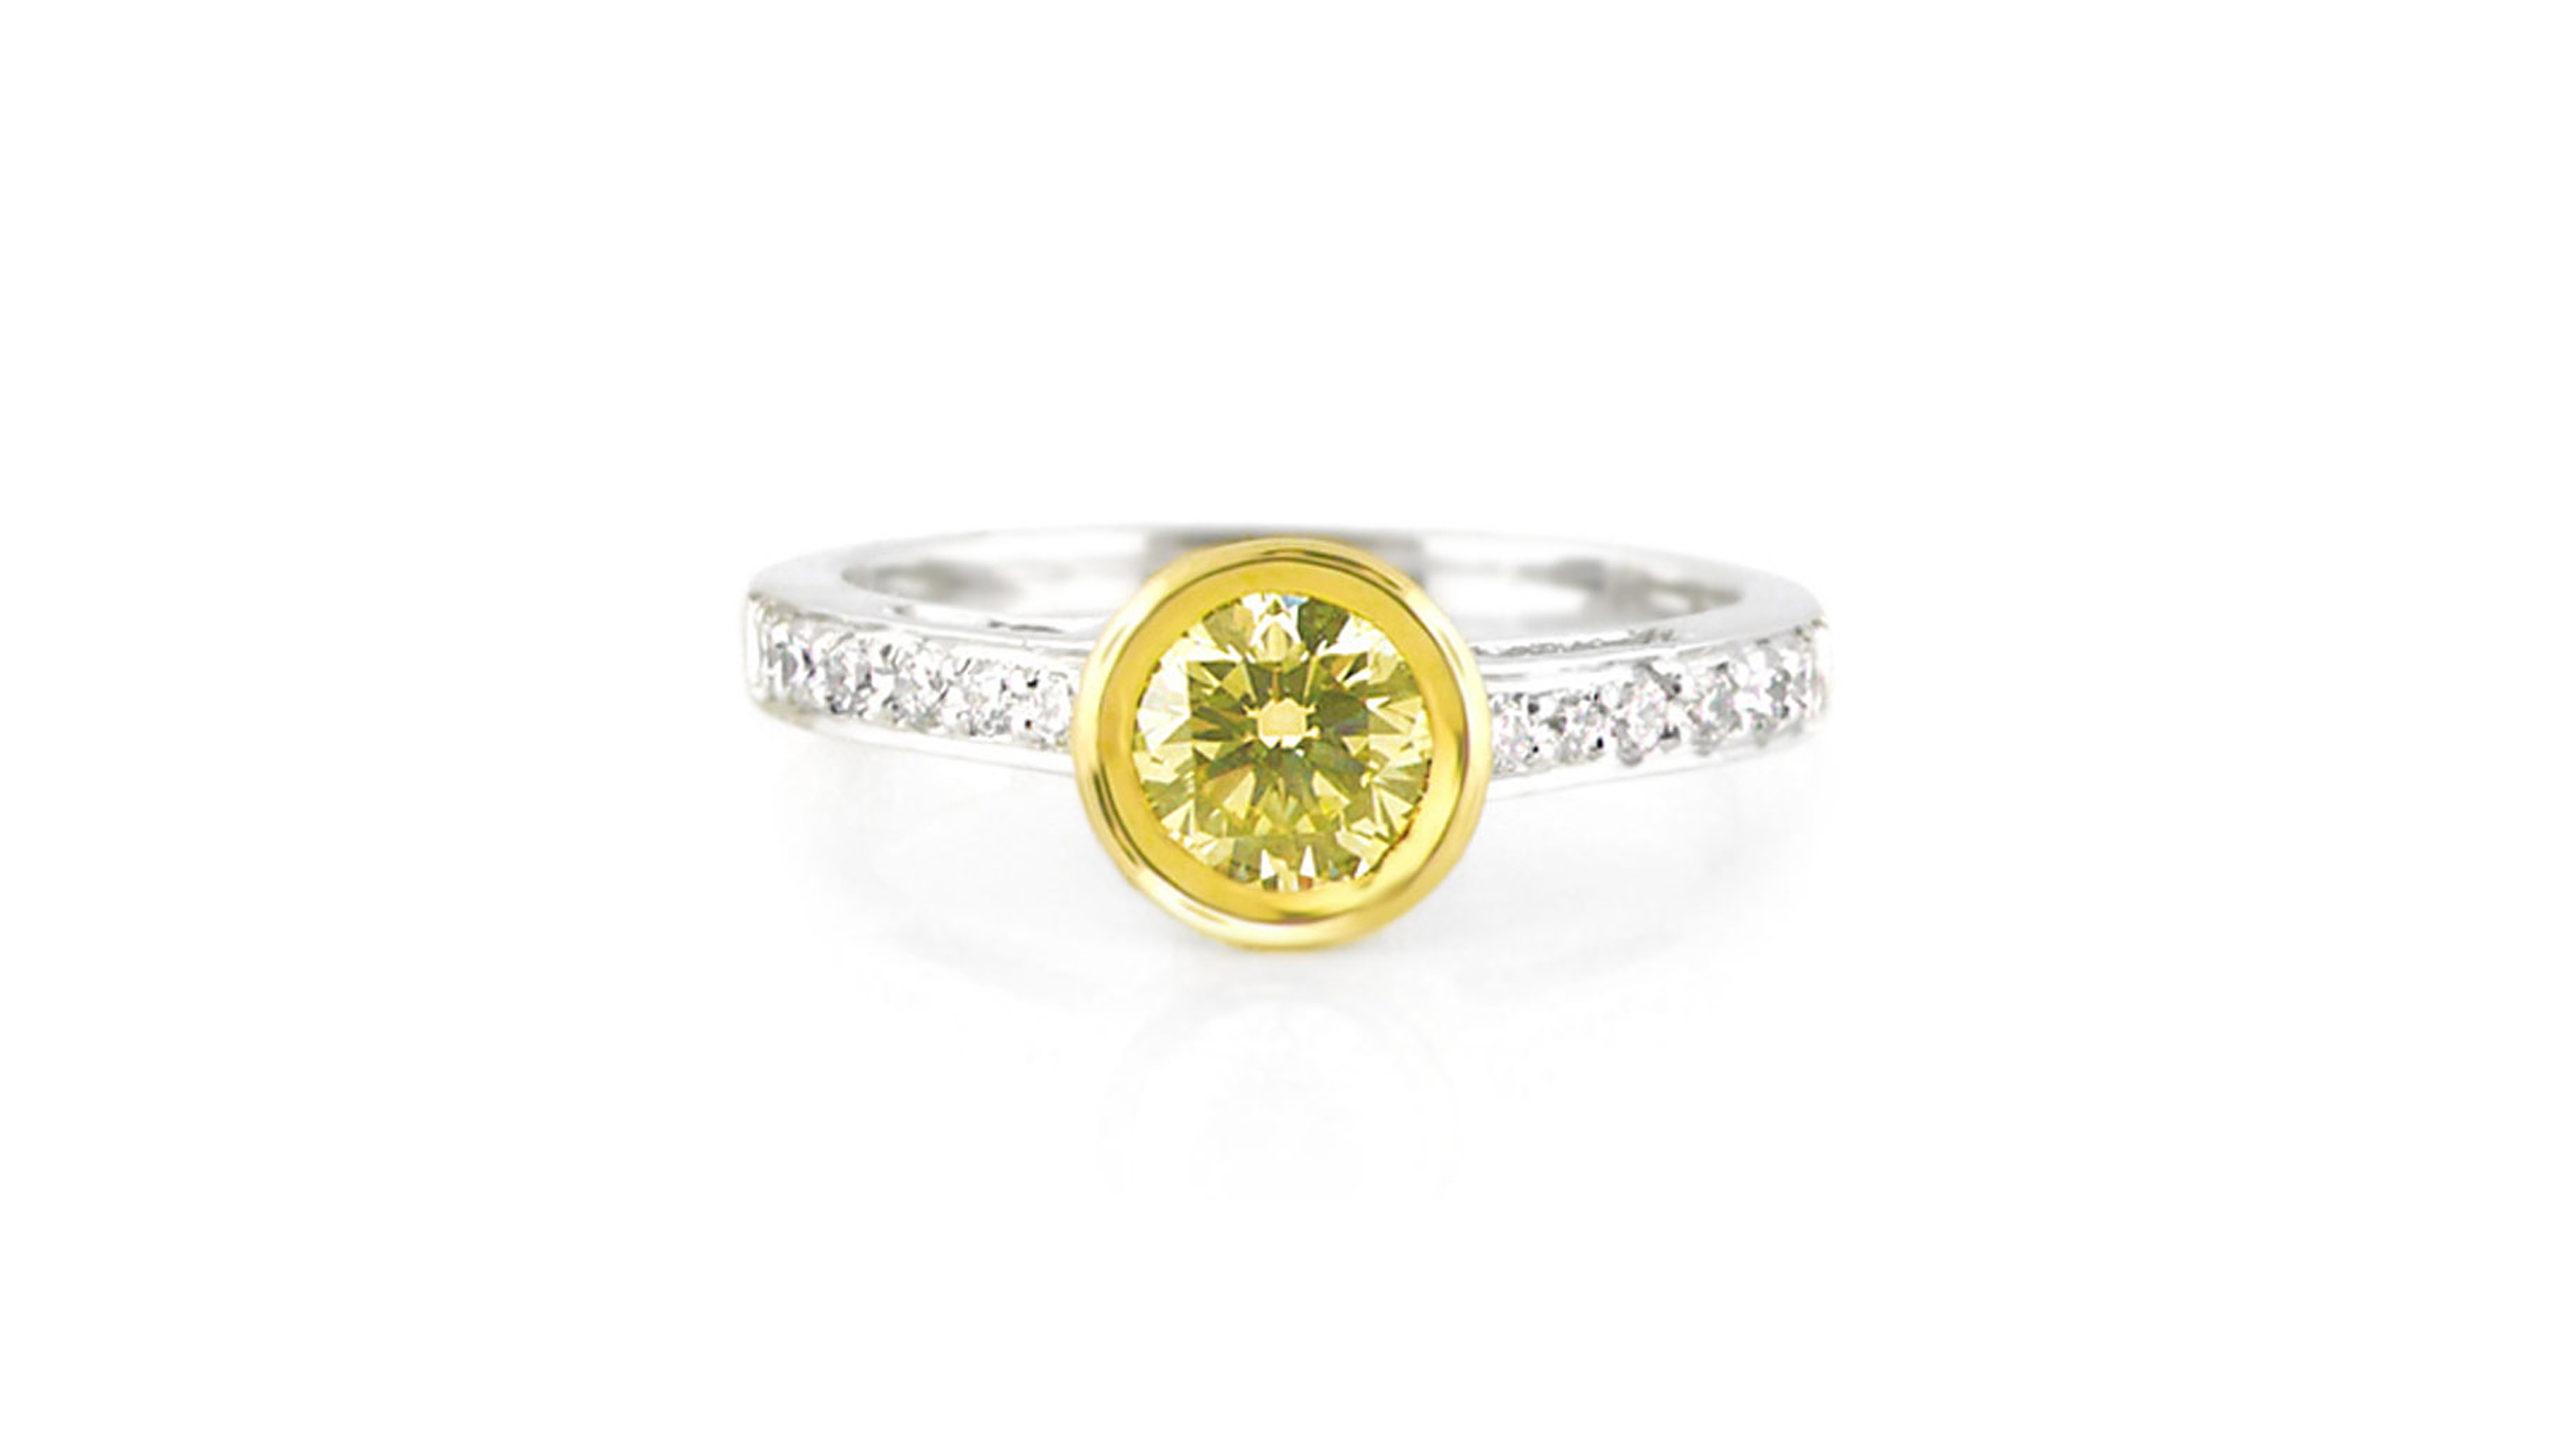 Tube-set yellow diamond ring | Set in 18 carat white and yellow gold